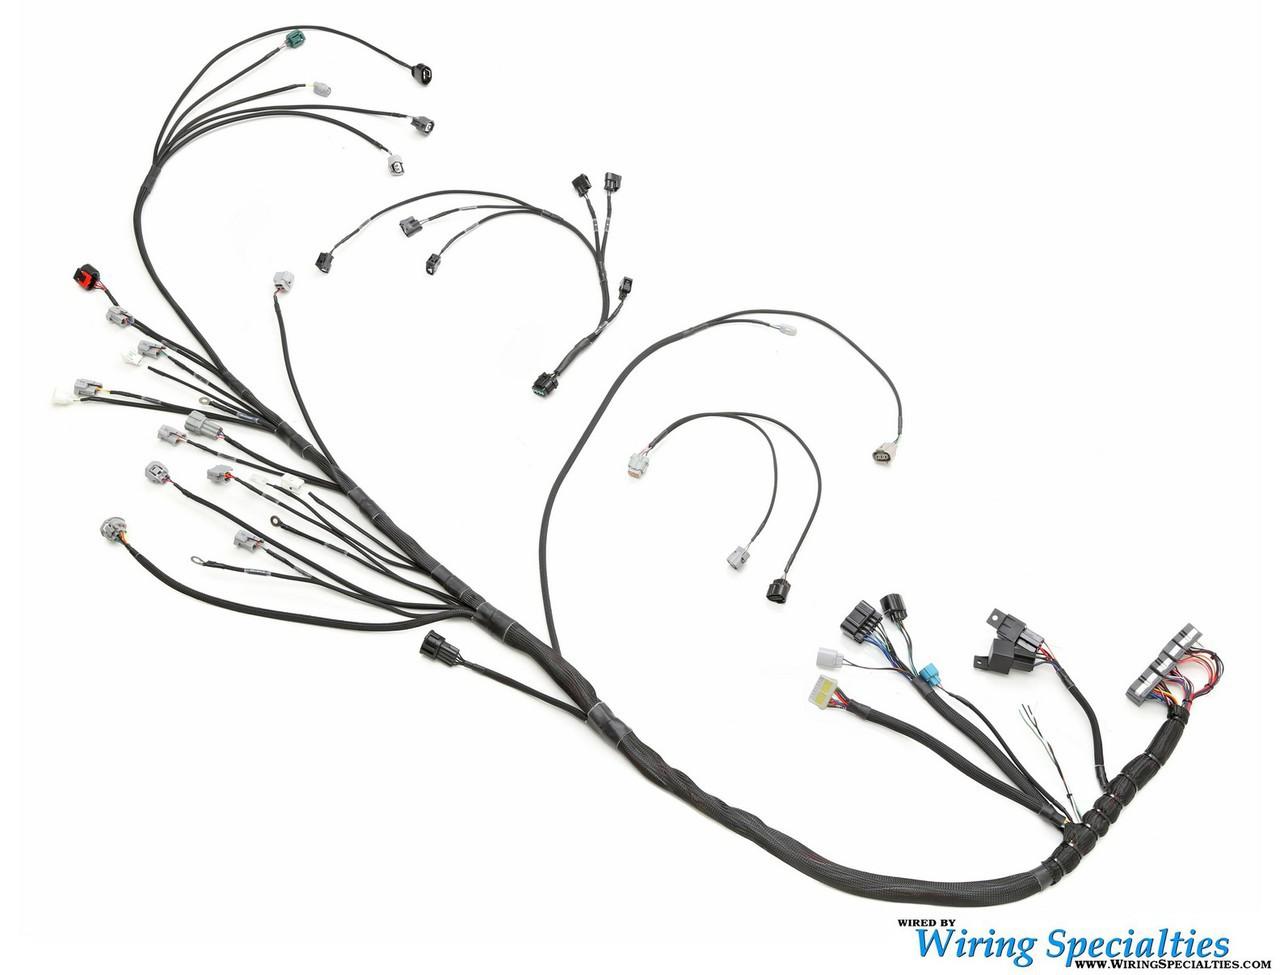 Wiring Specialties 1jzgte Silvia S14 Wiring Harness